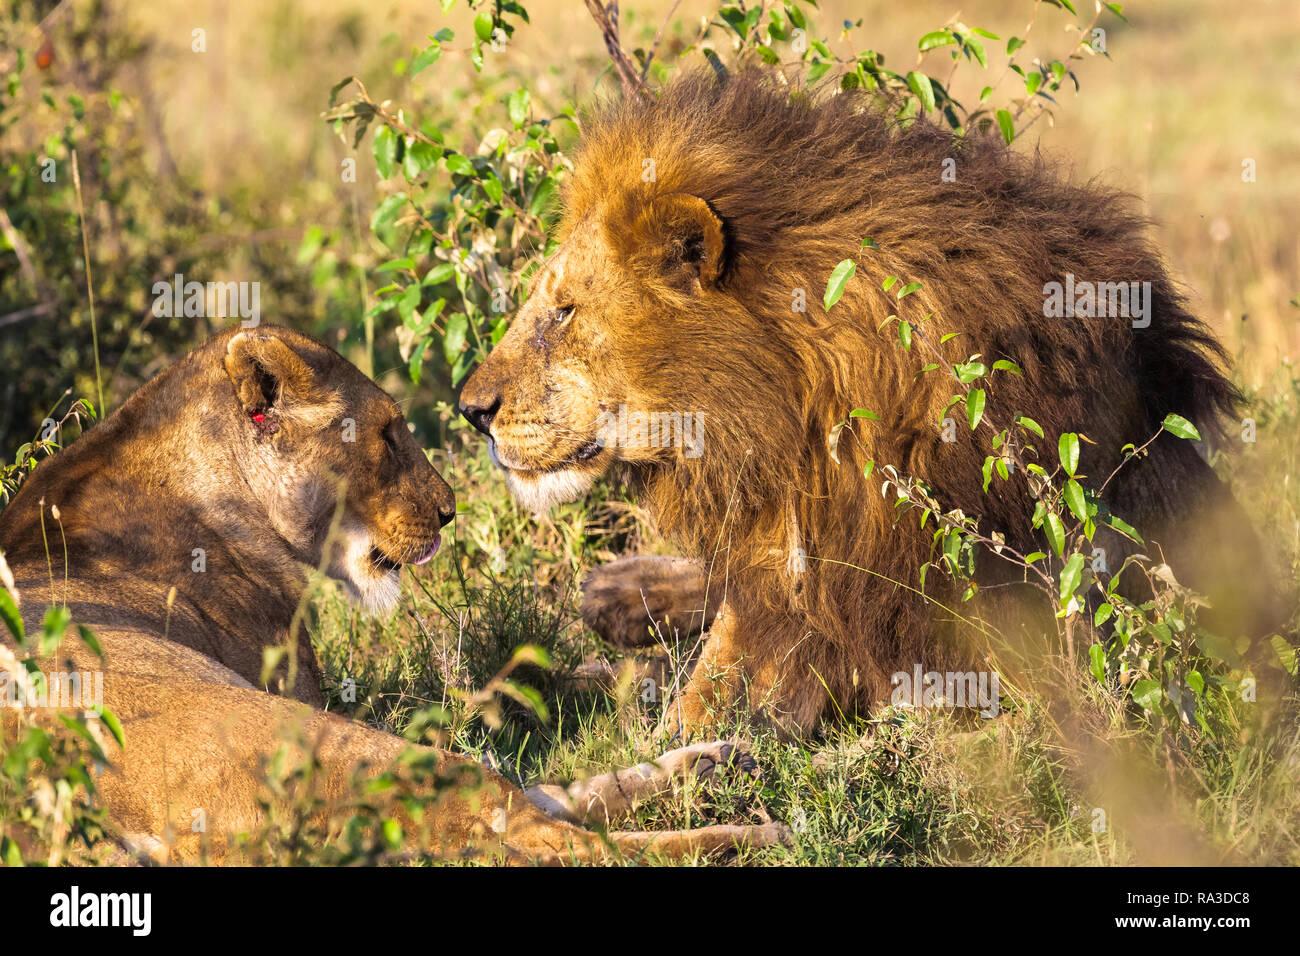 Loving couple. Lions in the savannah. Masai Mara, Kenya - Stock Photo